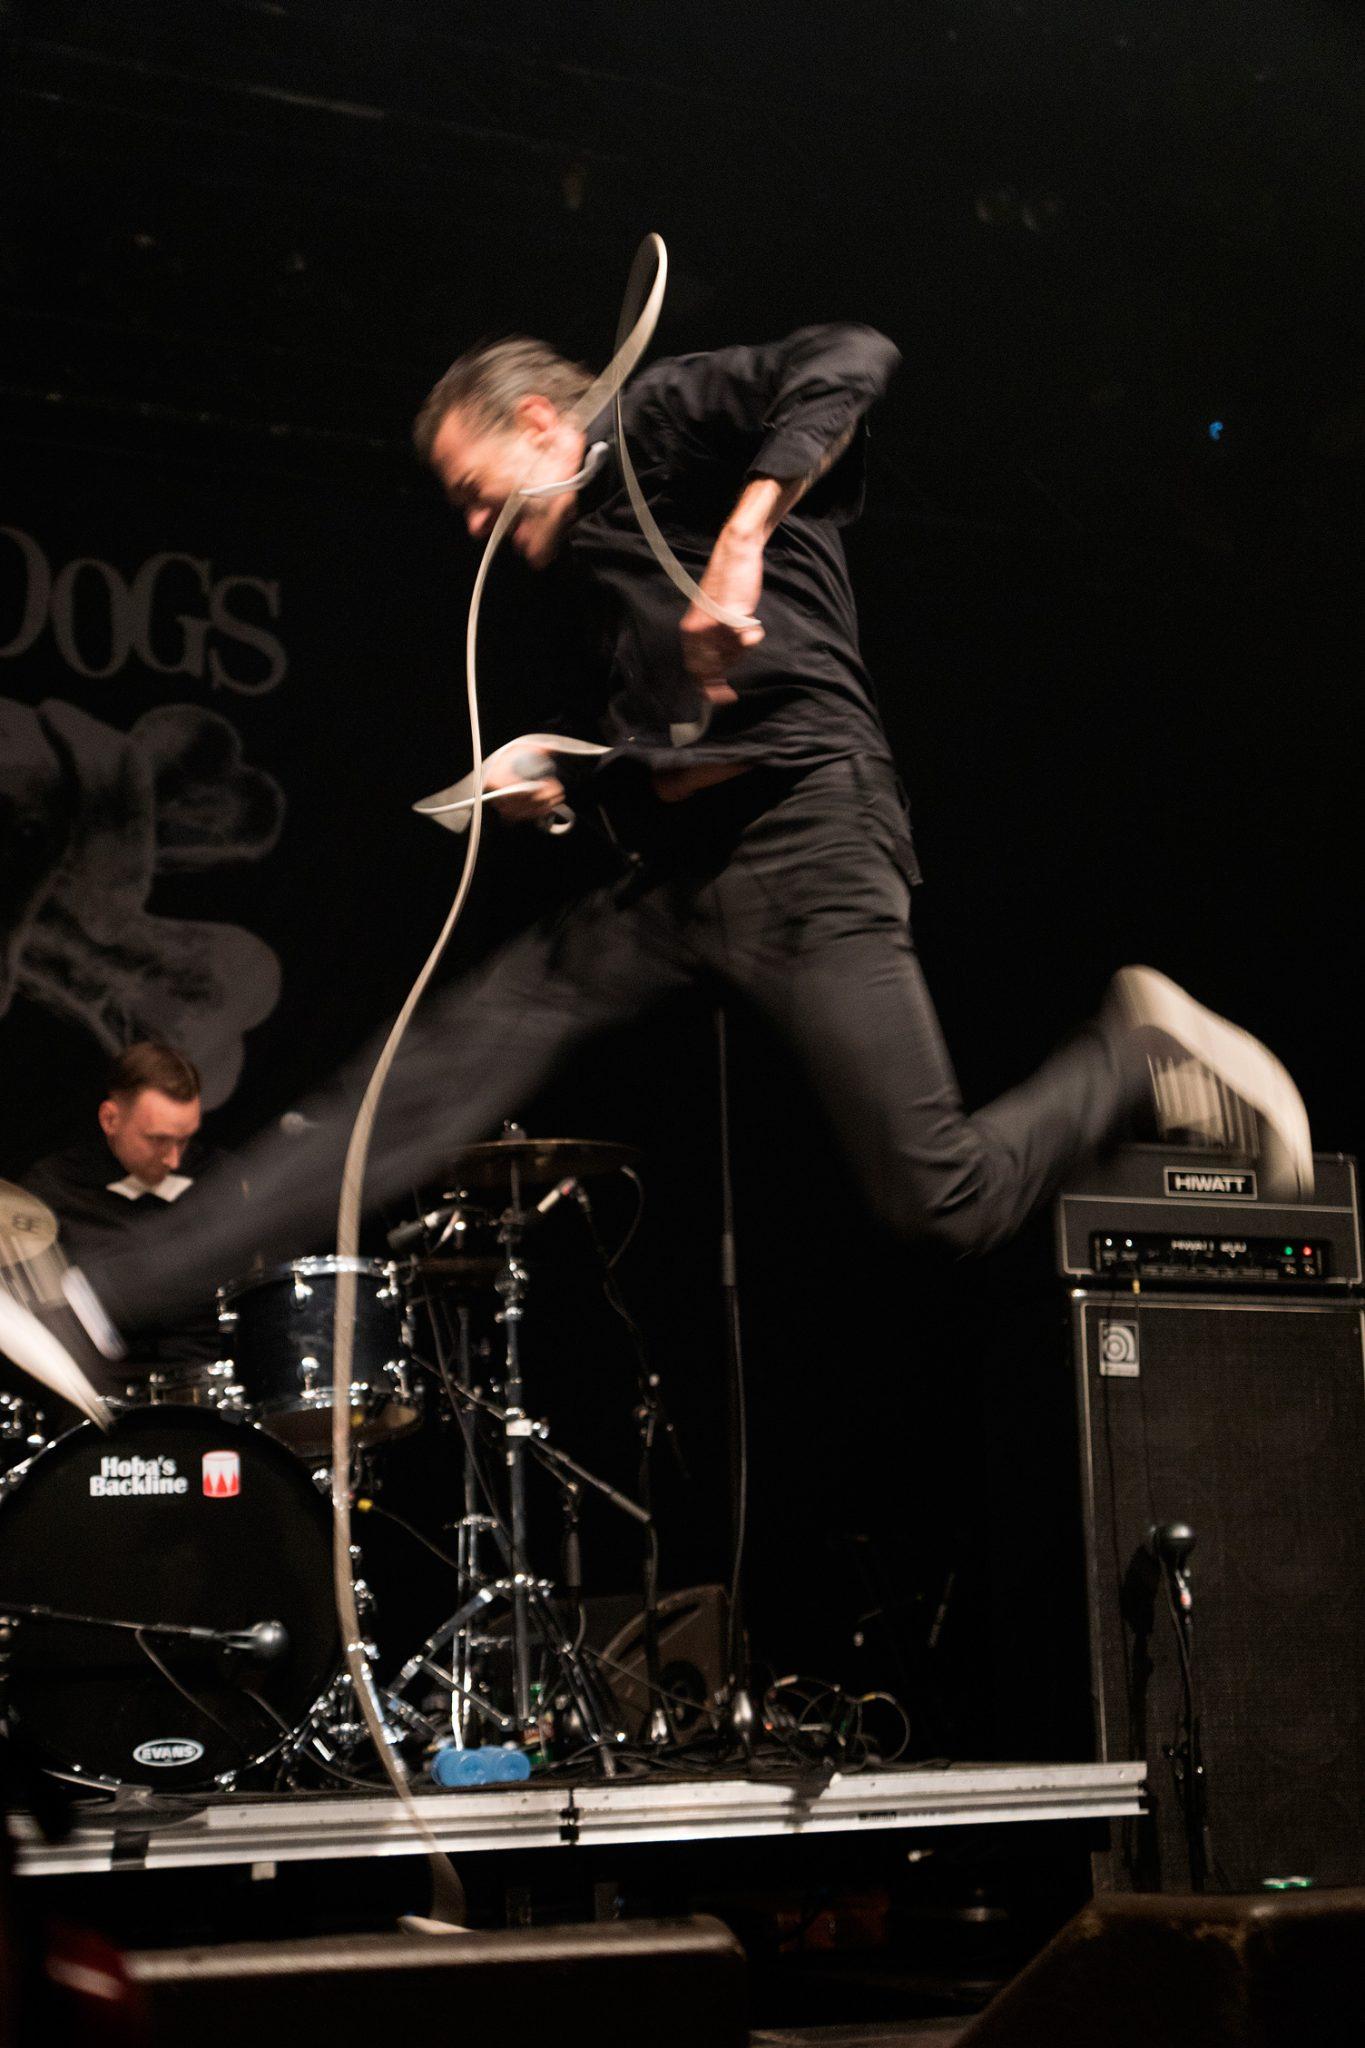 Kristopher Schau, The Dogs